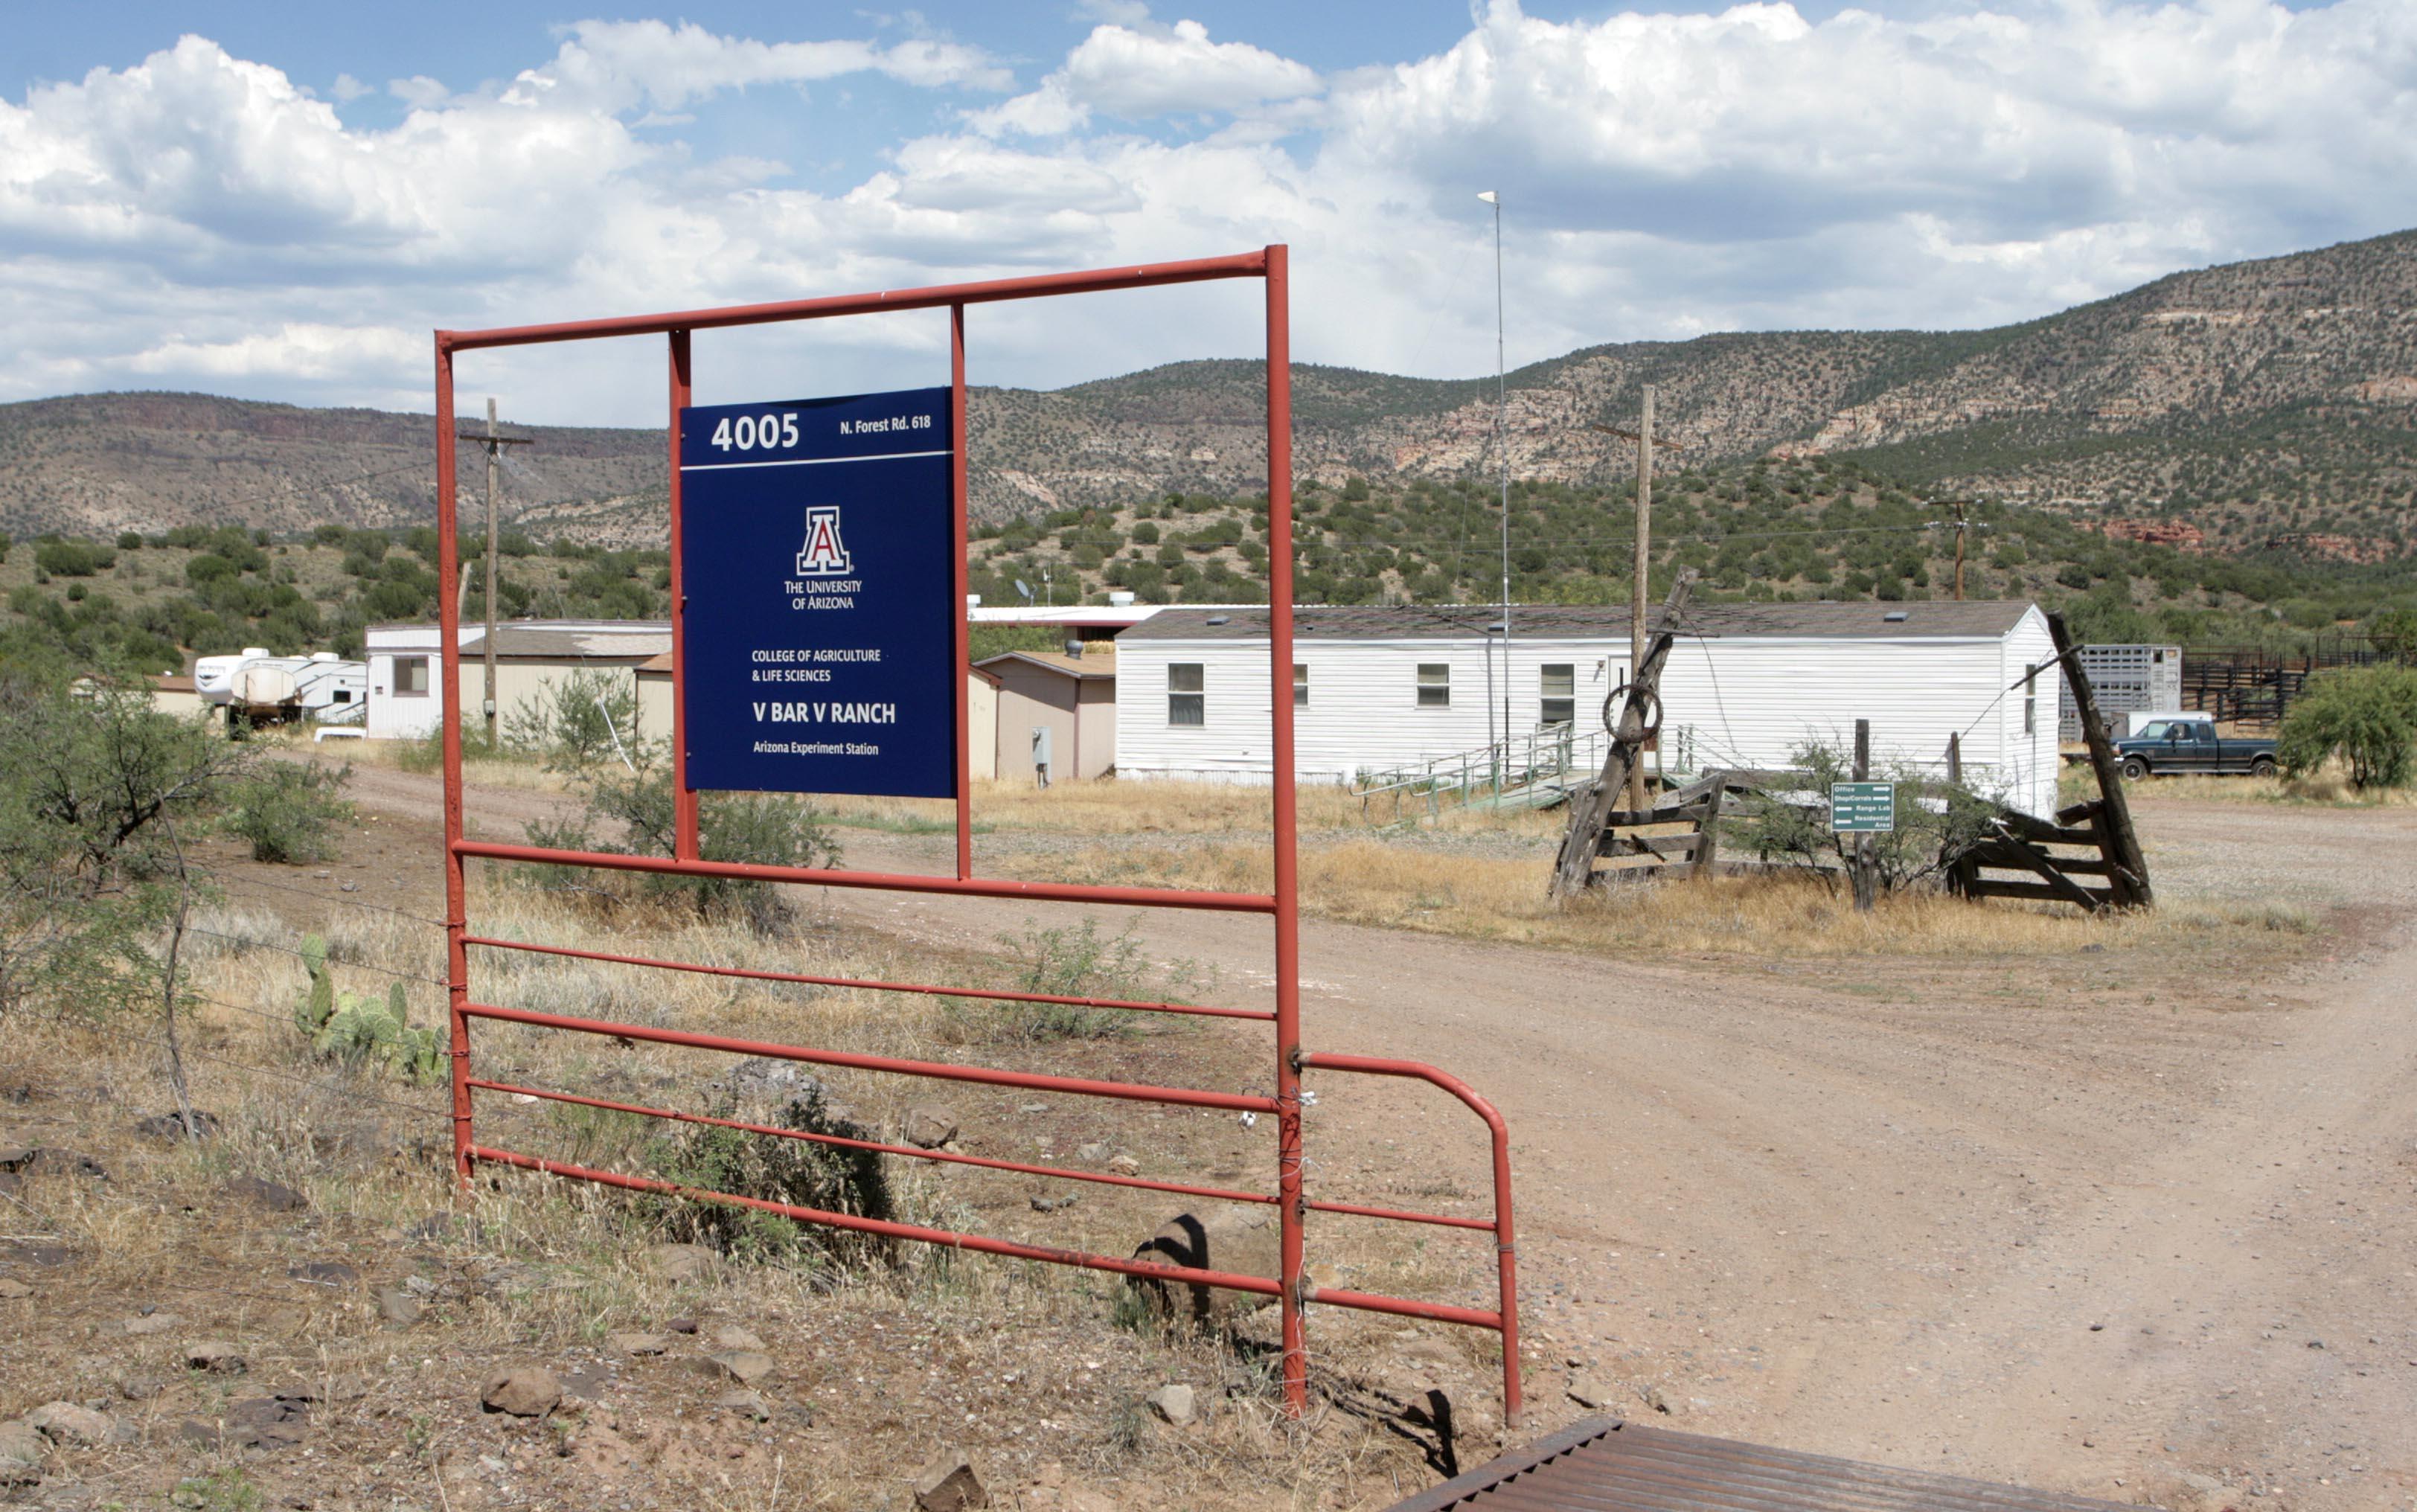 Land swap to give UofA property for Verde Valley veterinary school